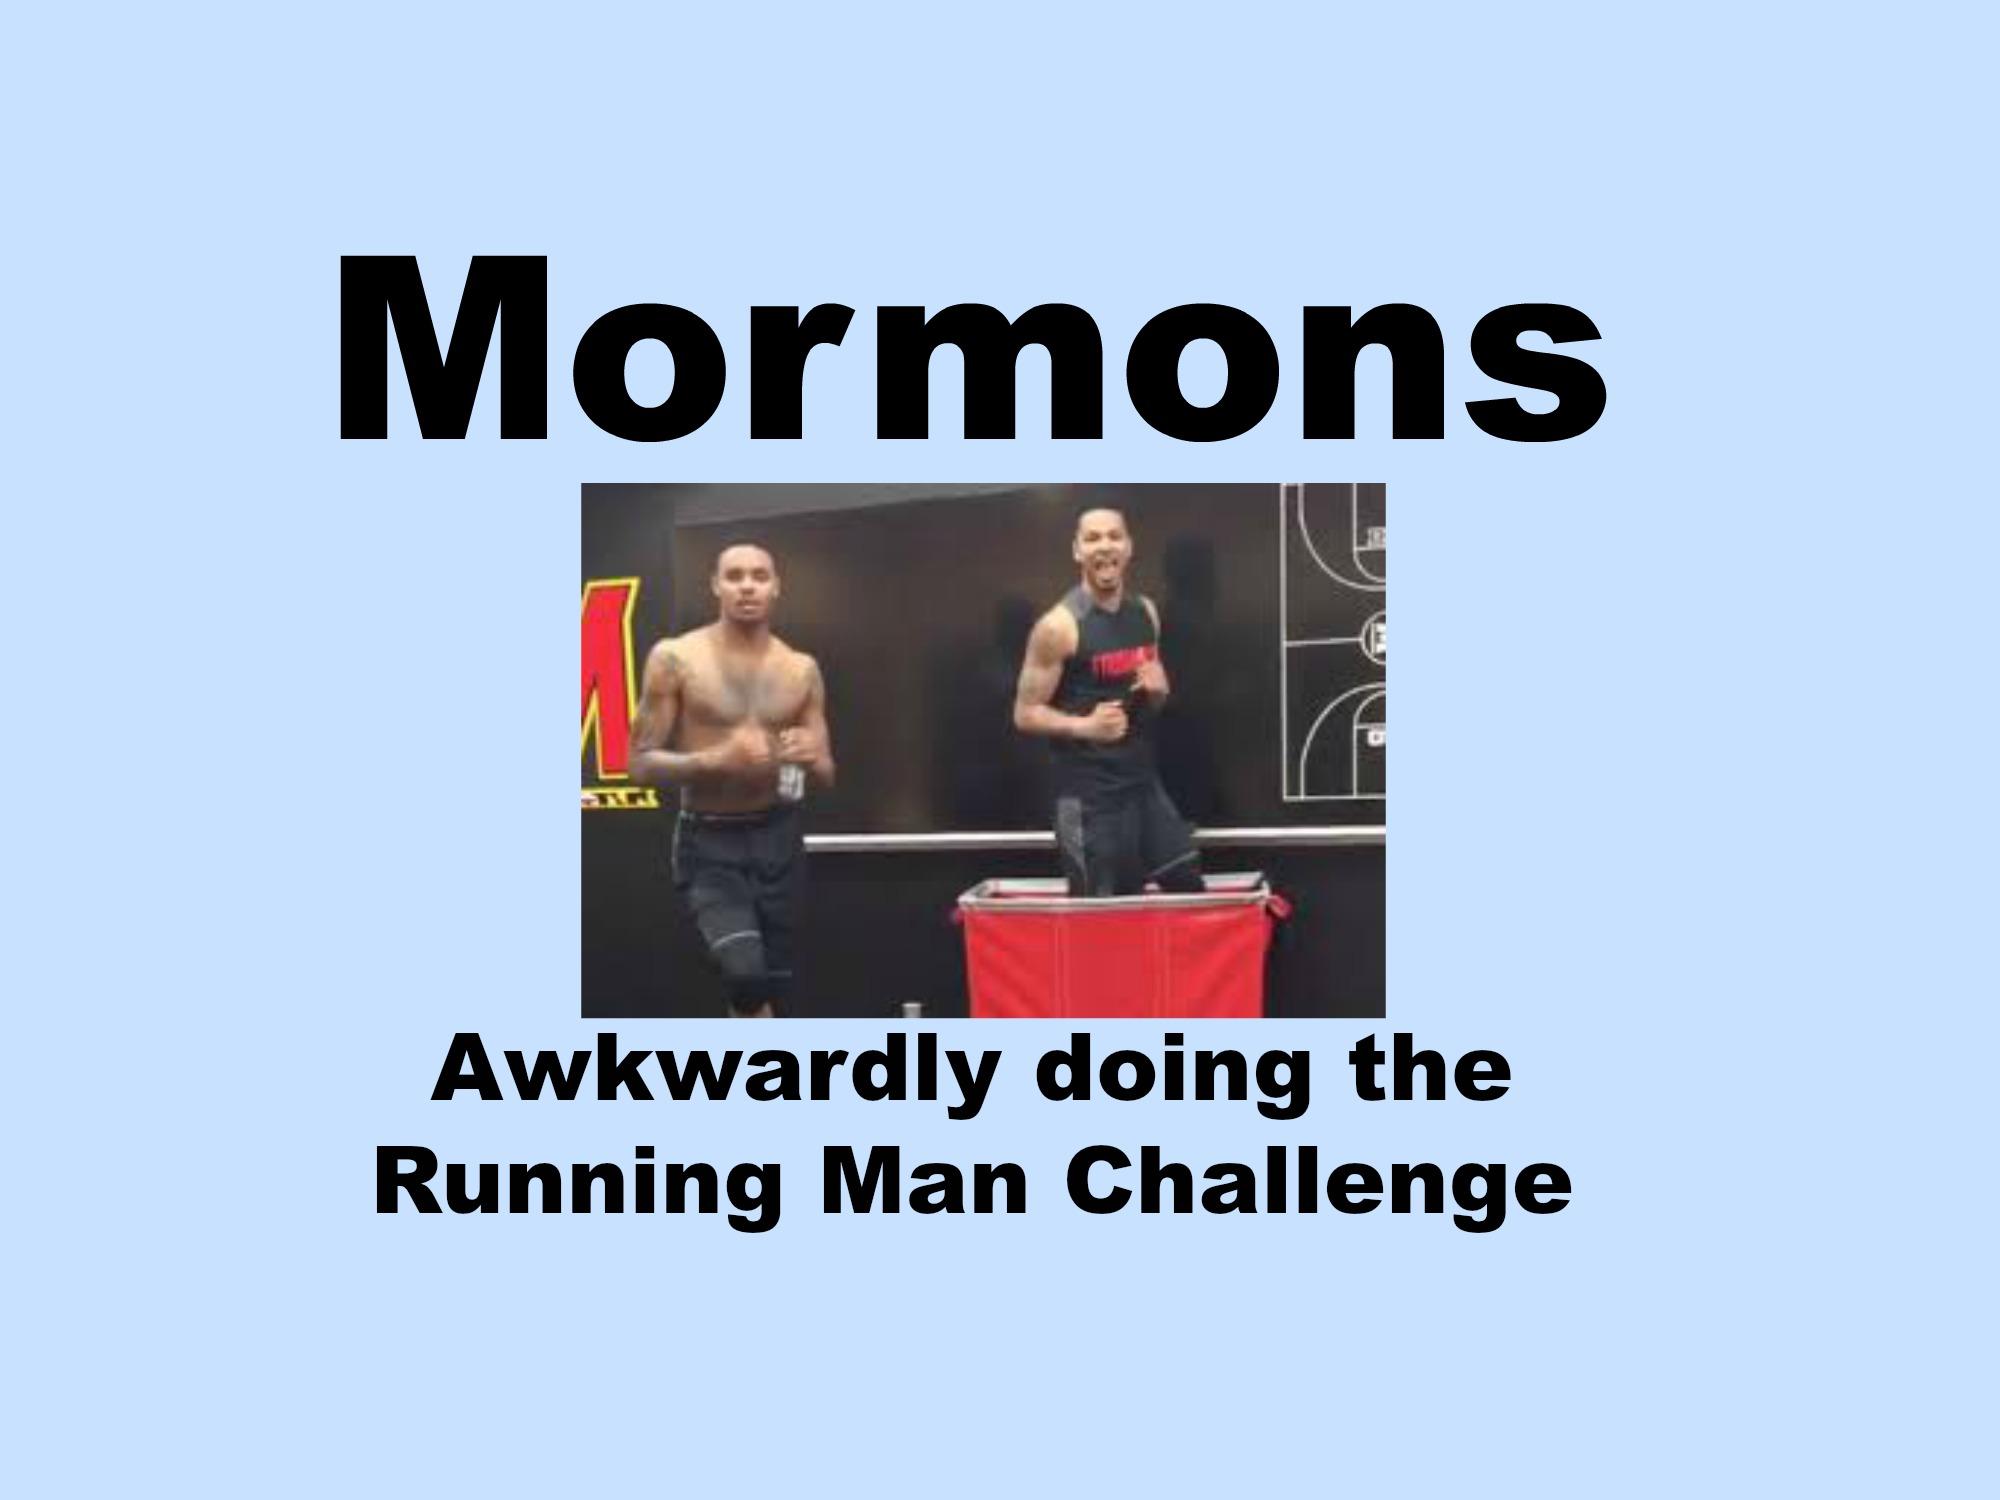 Mormons Awkwardly Doing The Running Man Challenge